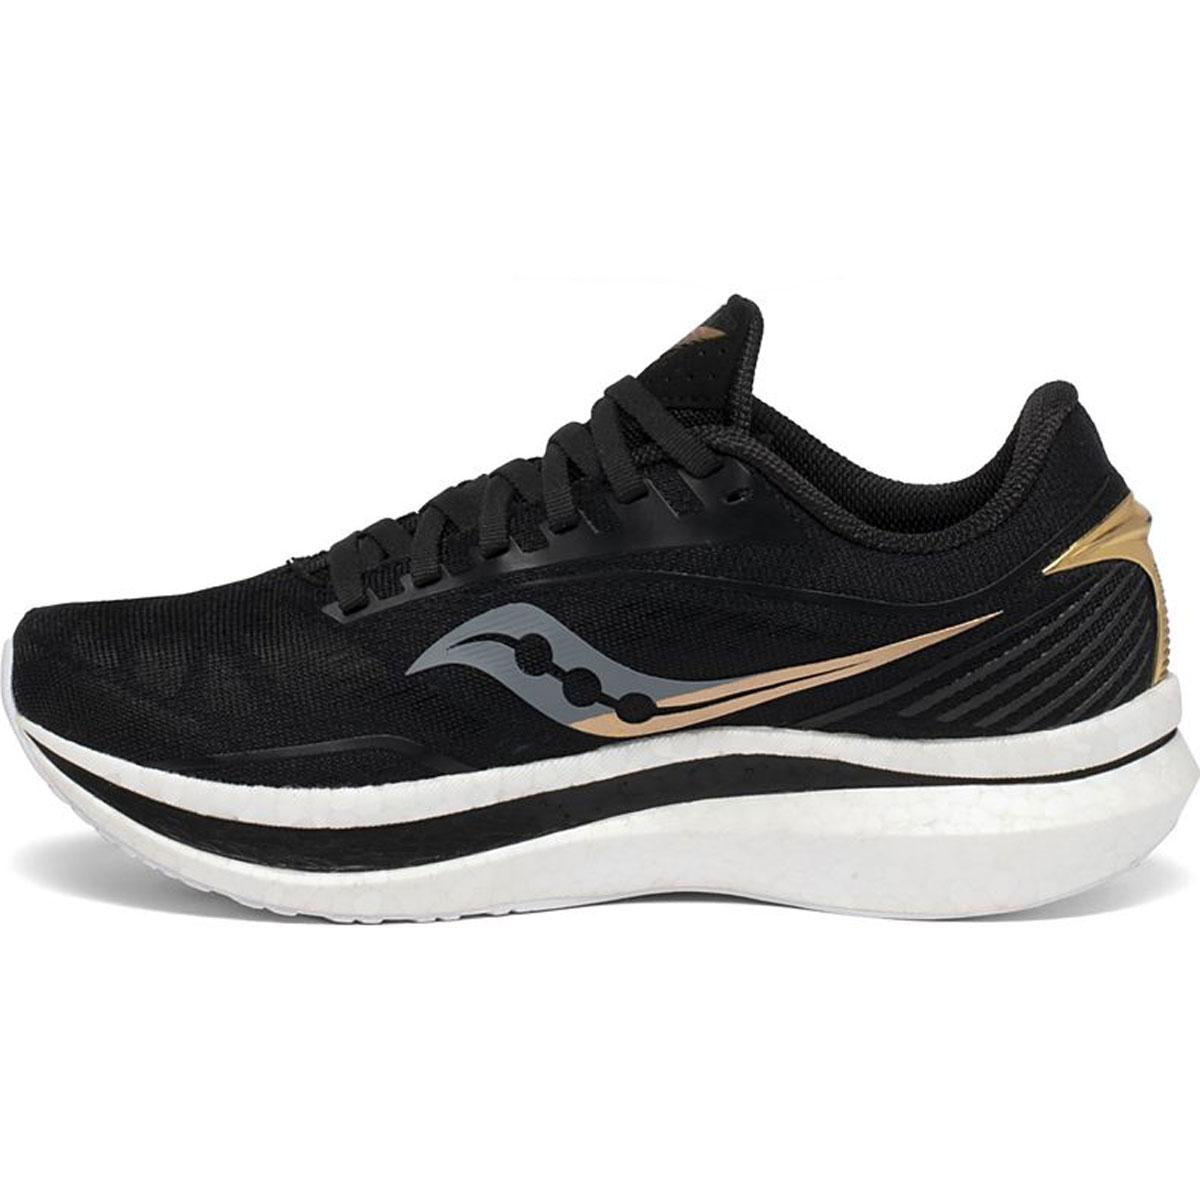 Women's Saucony Endorphin Speed Running Shoe - Color: Black/Gold - Size: 5 - Width: Regular, Black/Gold, large, image 2